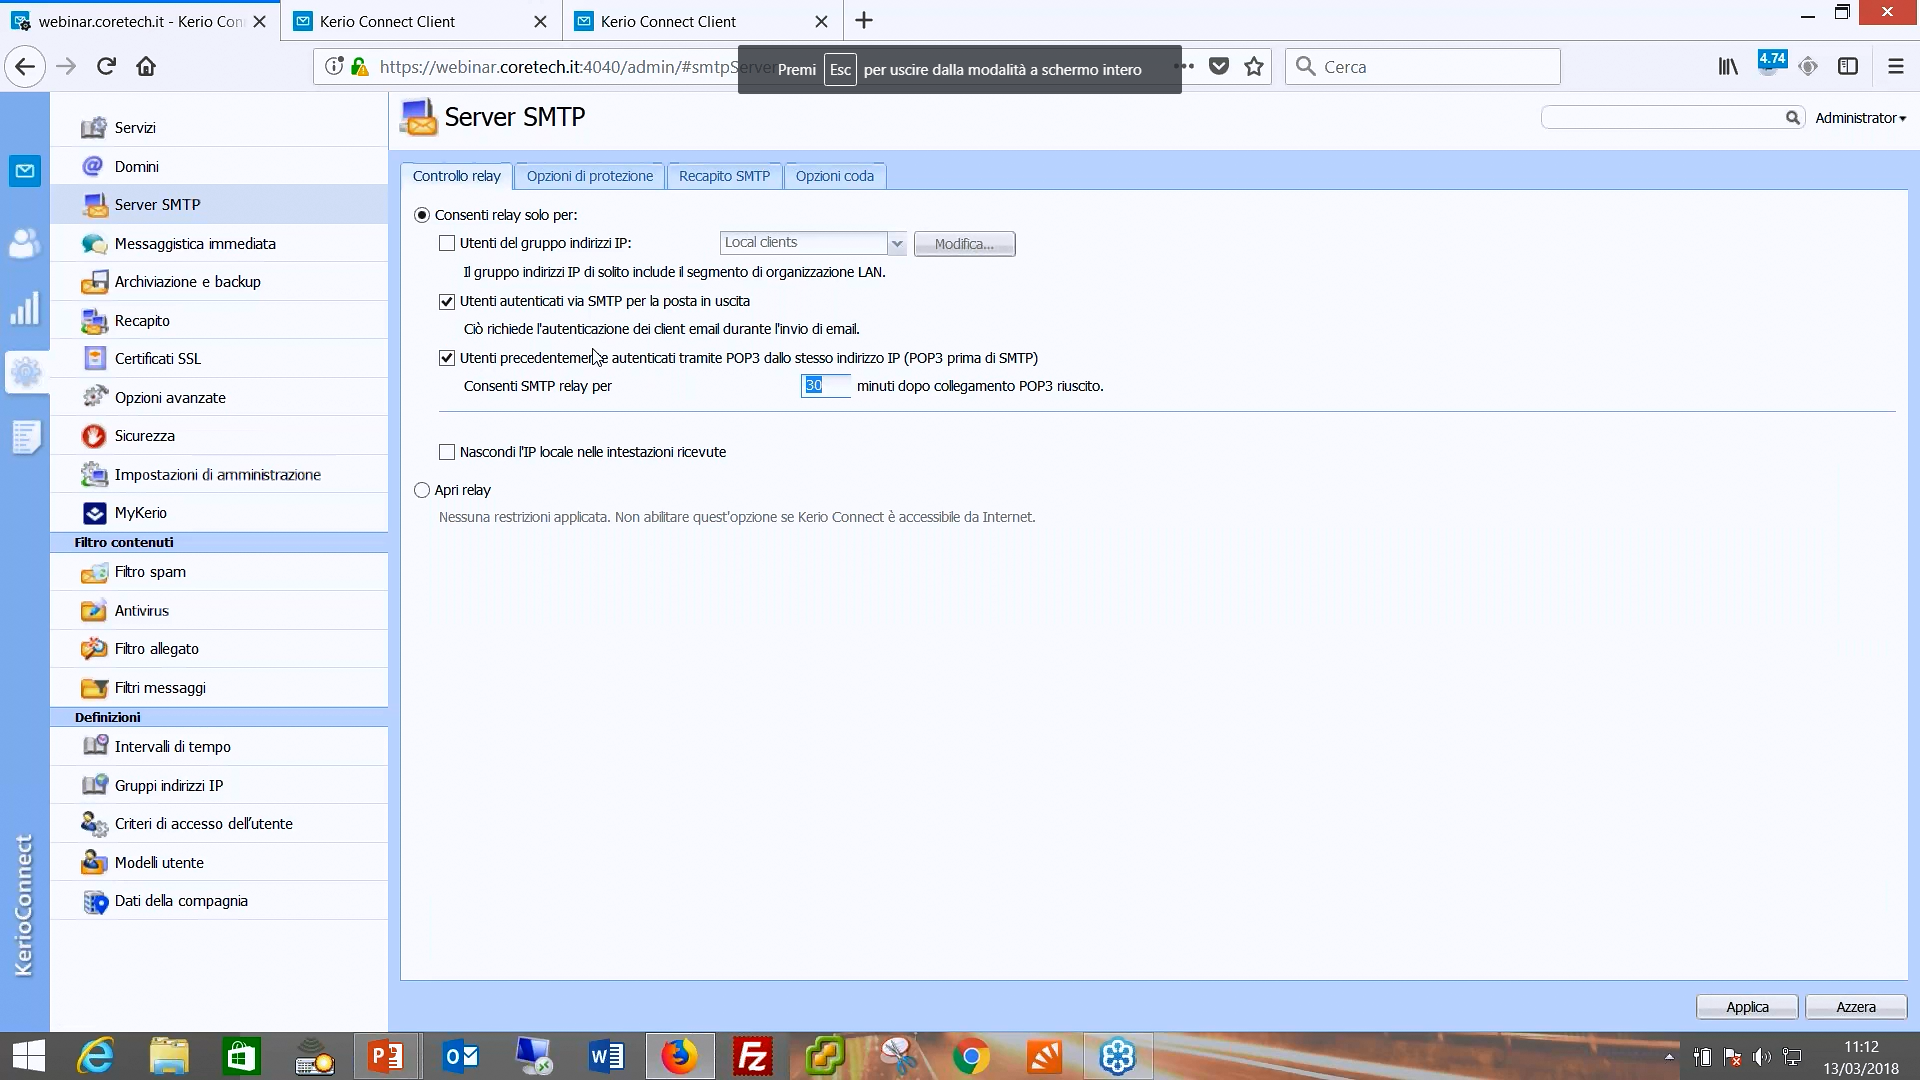 Nessuna e-mail richiesta hook up sito